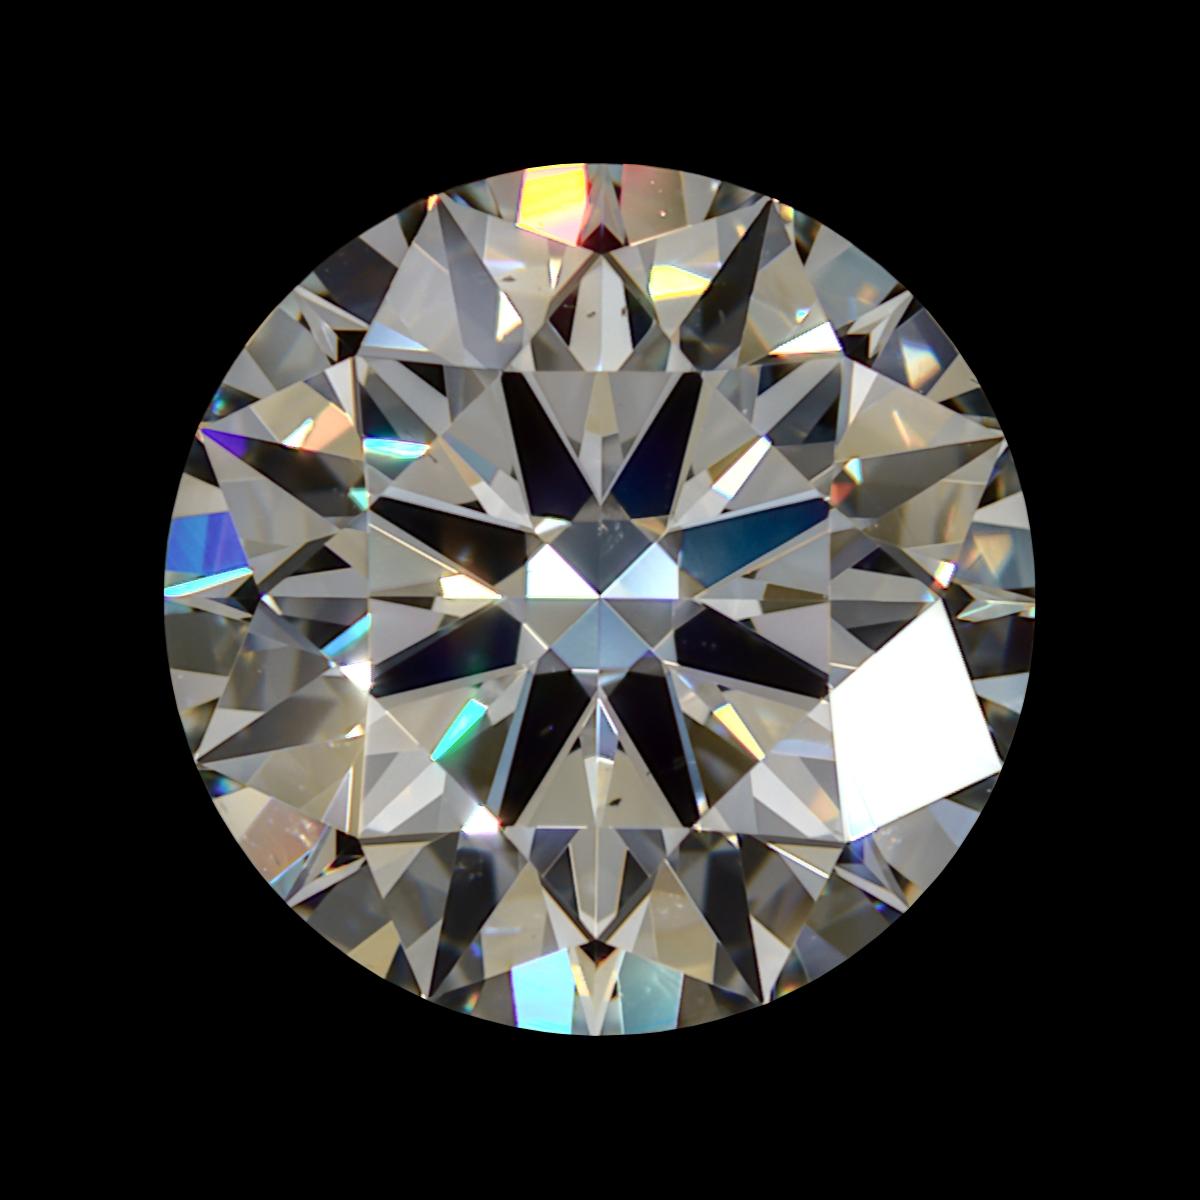 https://cdn.briangavindiamonds.com/files/mp4/AGS-104114551013/AGS-104114551013-Fire-02.mp4